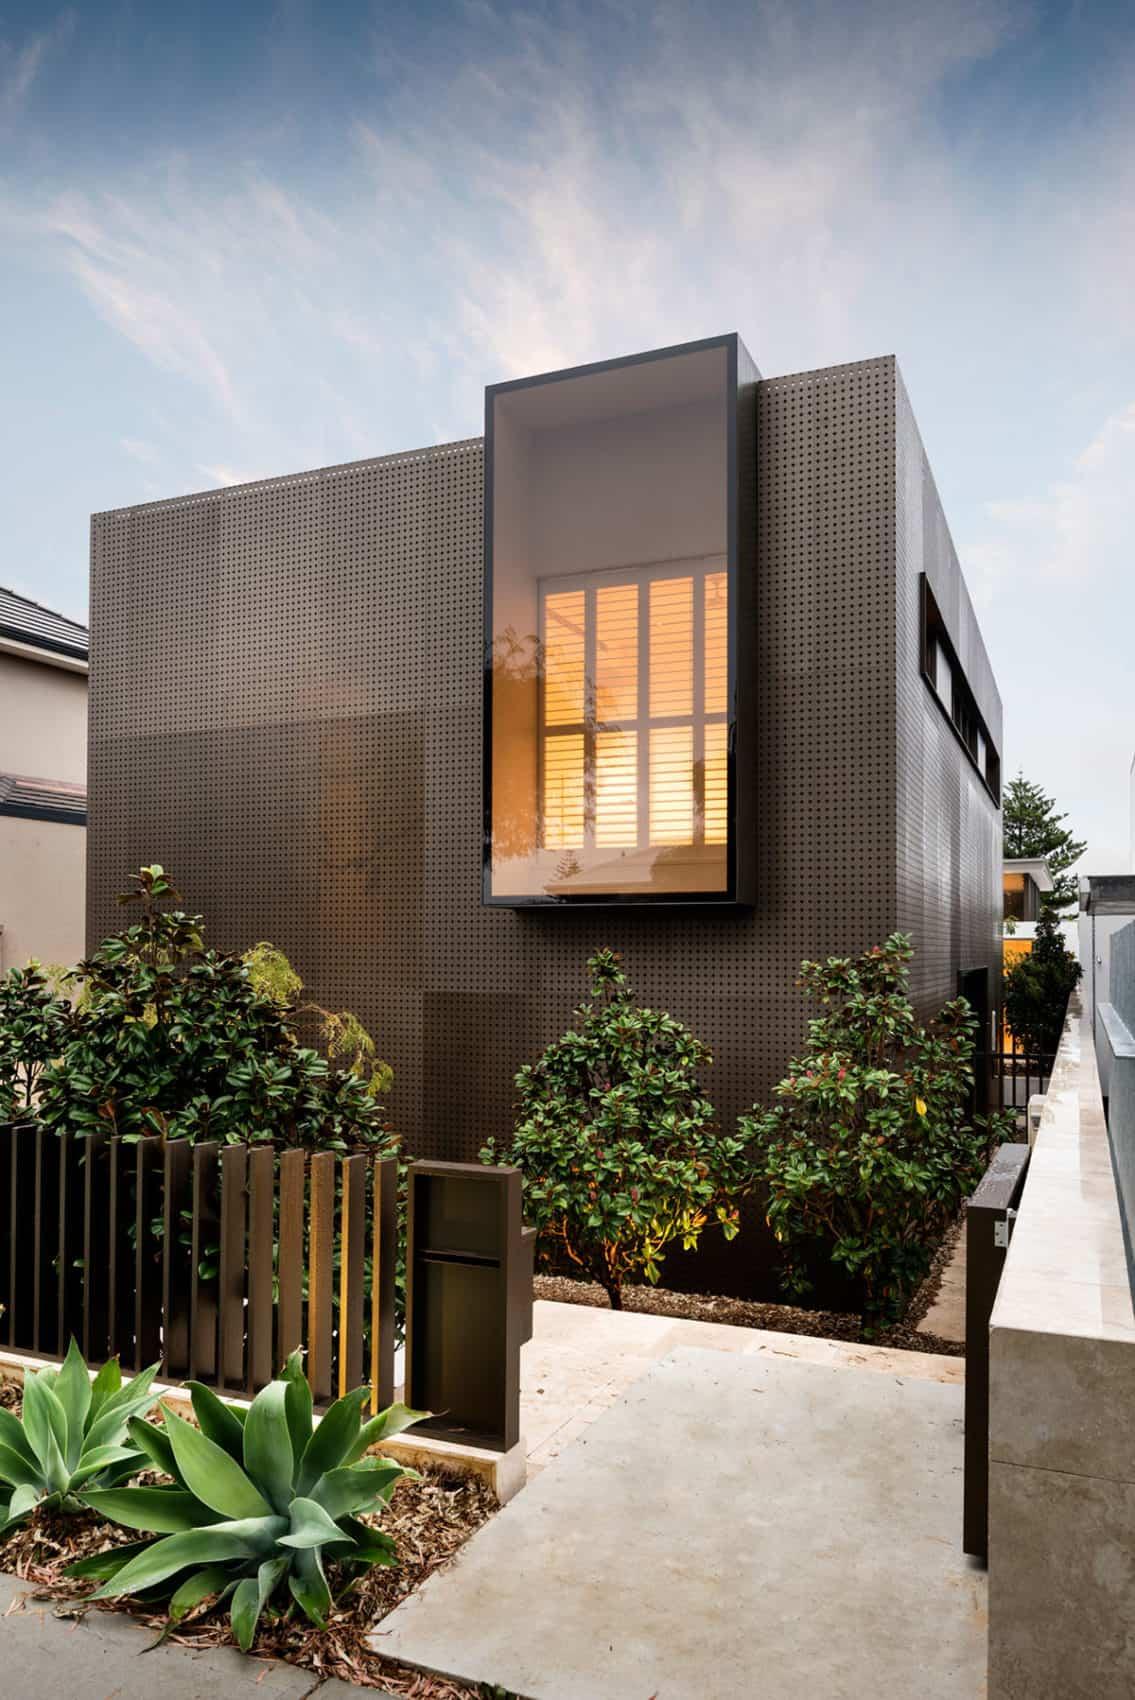 Chamberlain Street by Weststyle Design & Development (5)